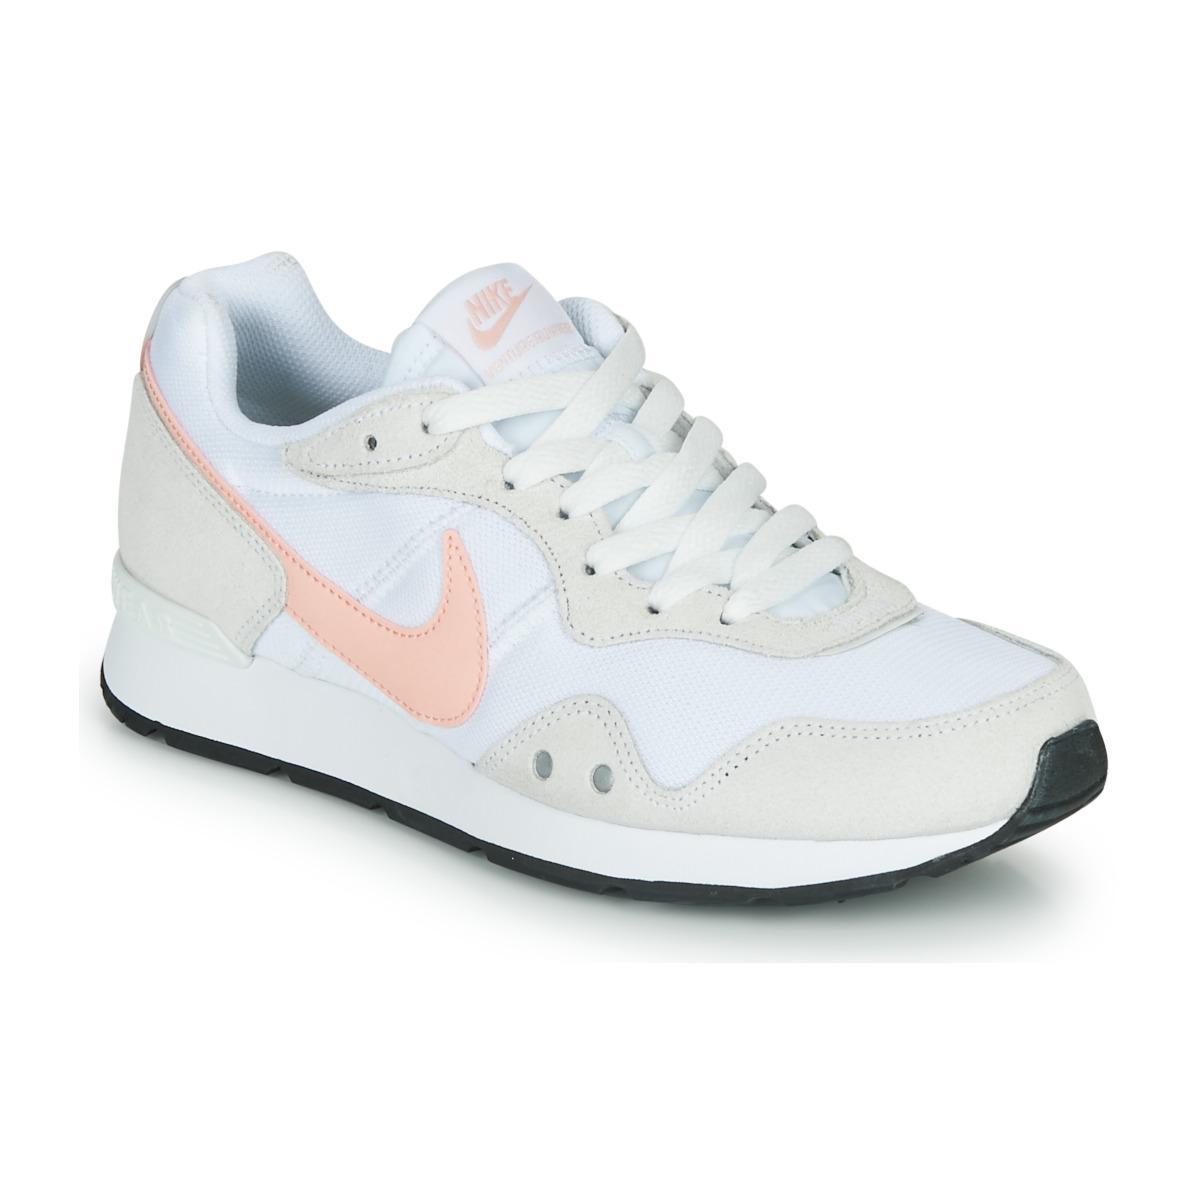 VENTURE RUNNER Chaussures Nike en coloris Blanc - 25 % de ...